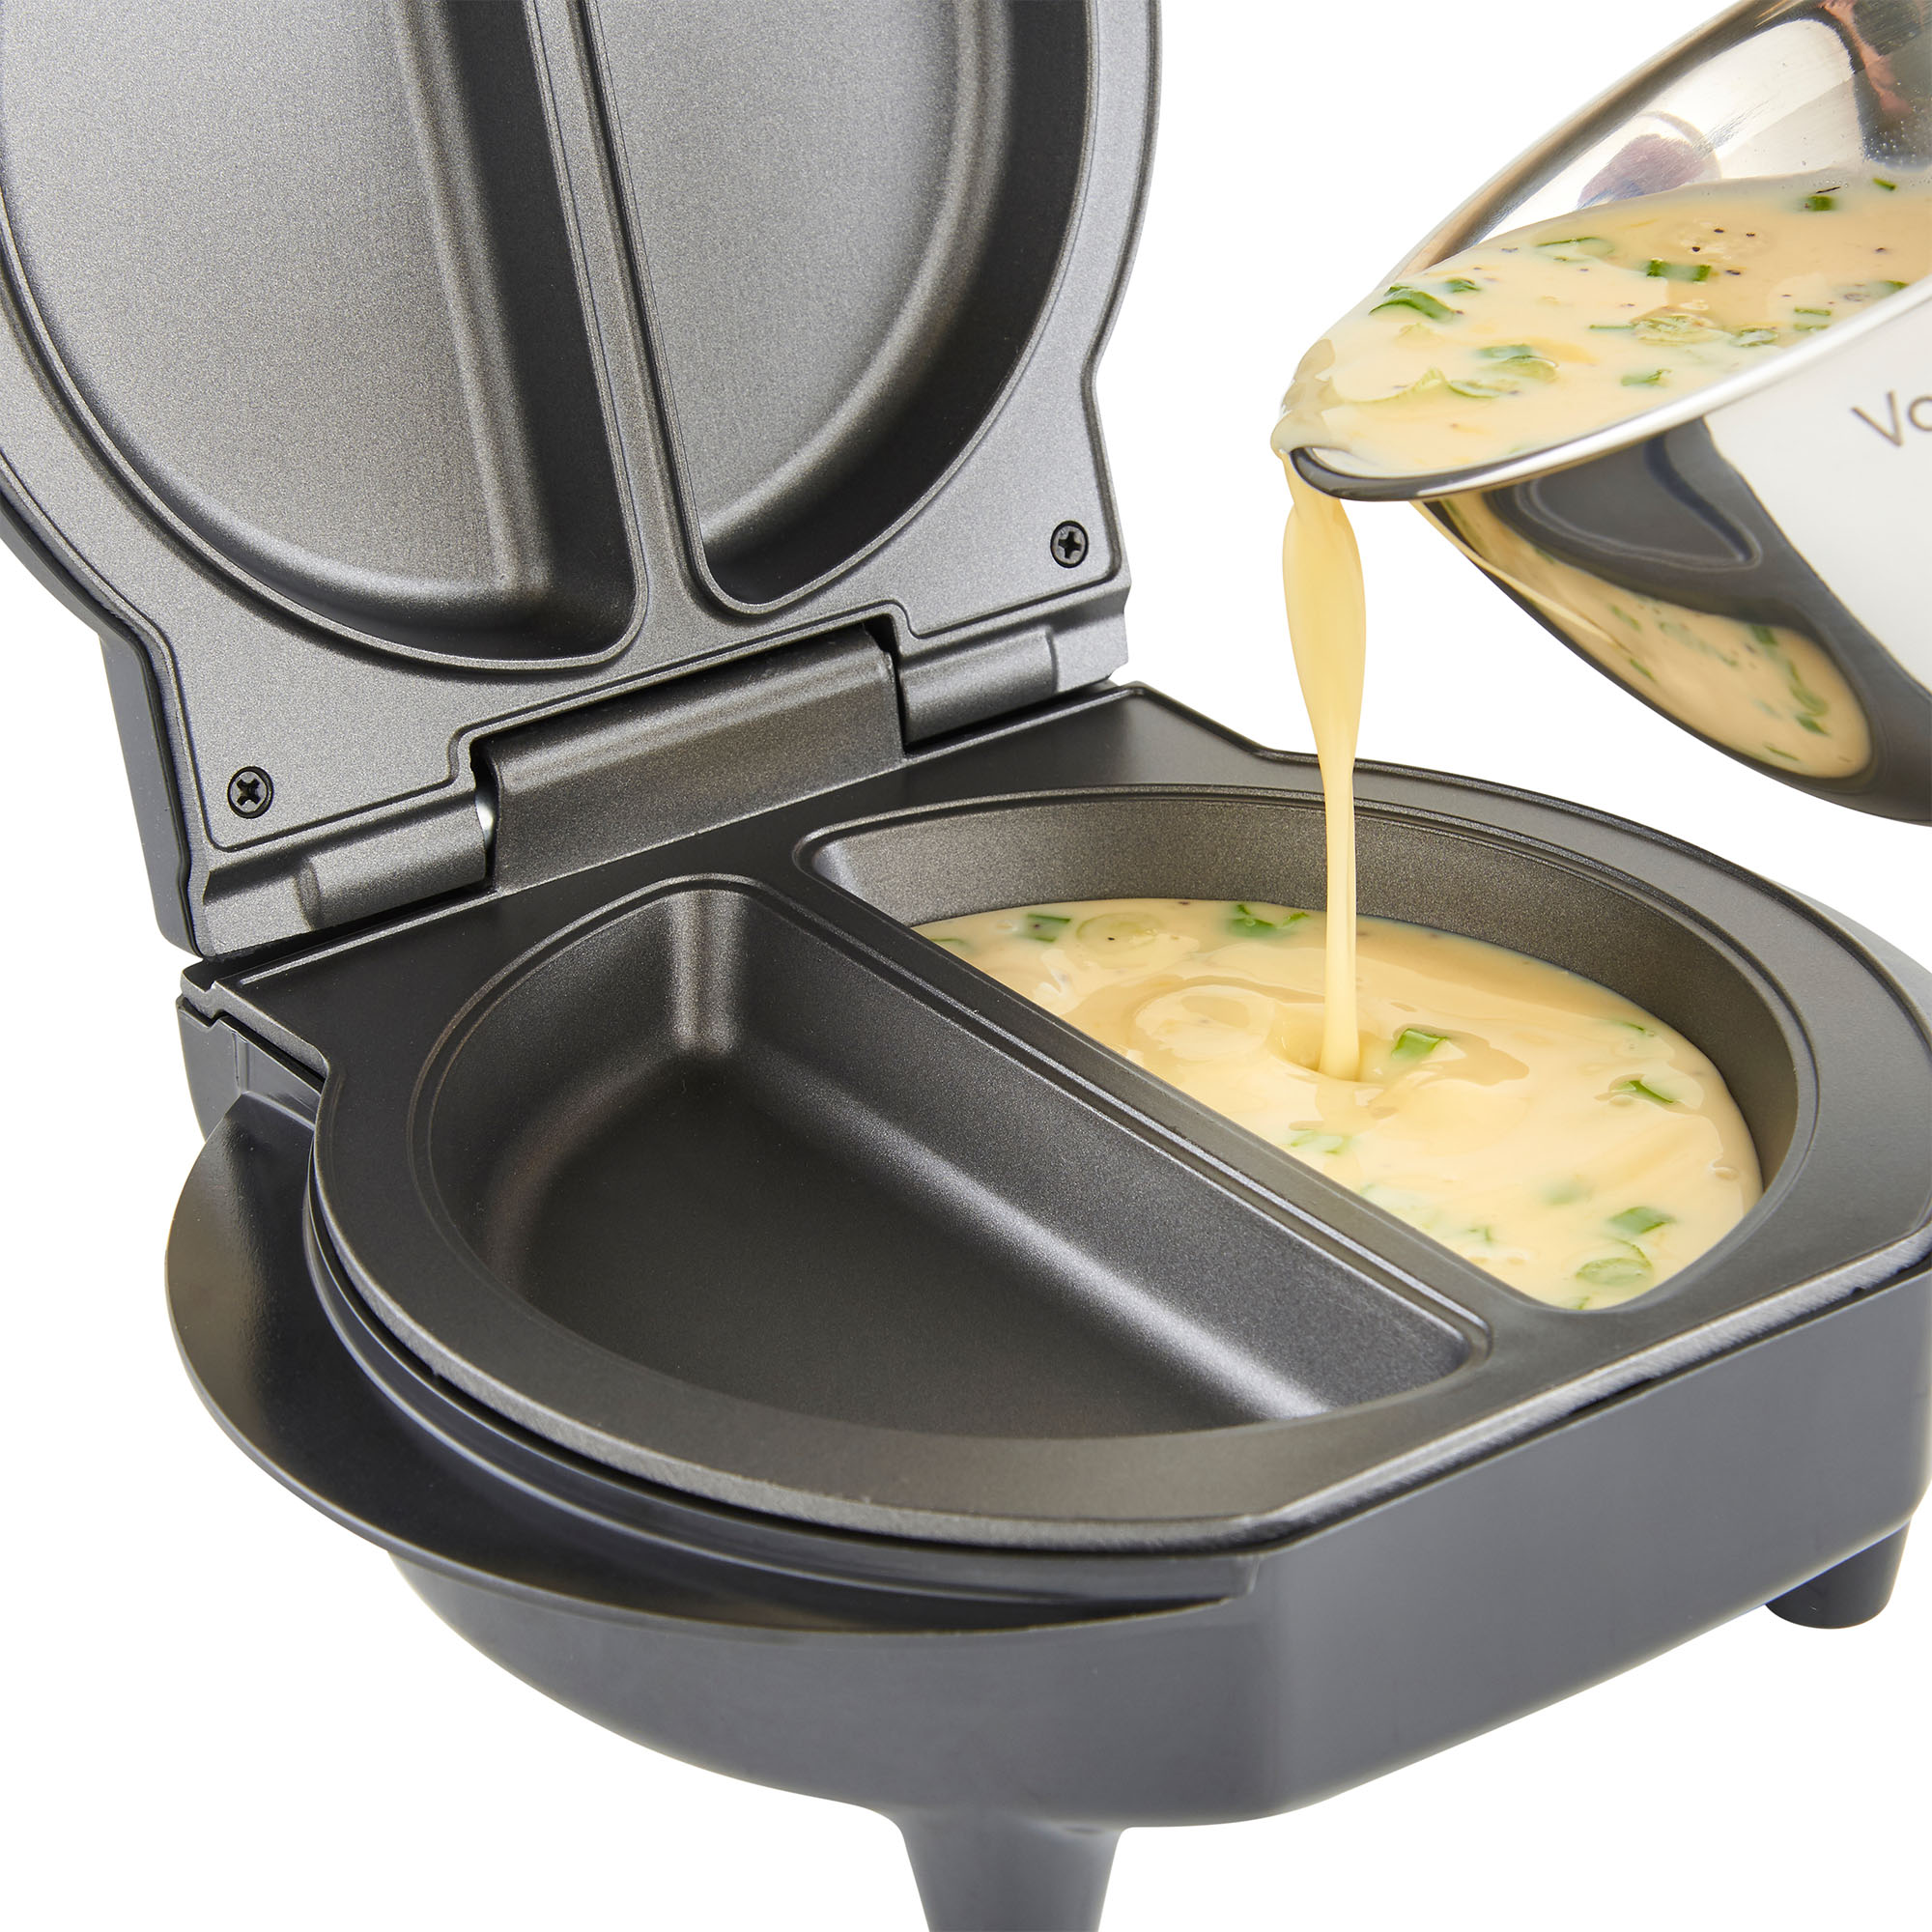 Vonshef Omelette Maker Electric Non Stick Egg Fryer Pan